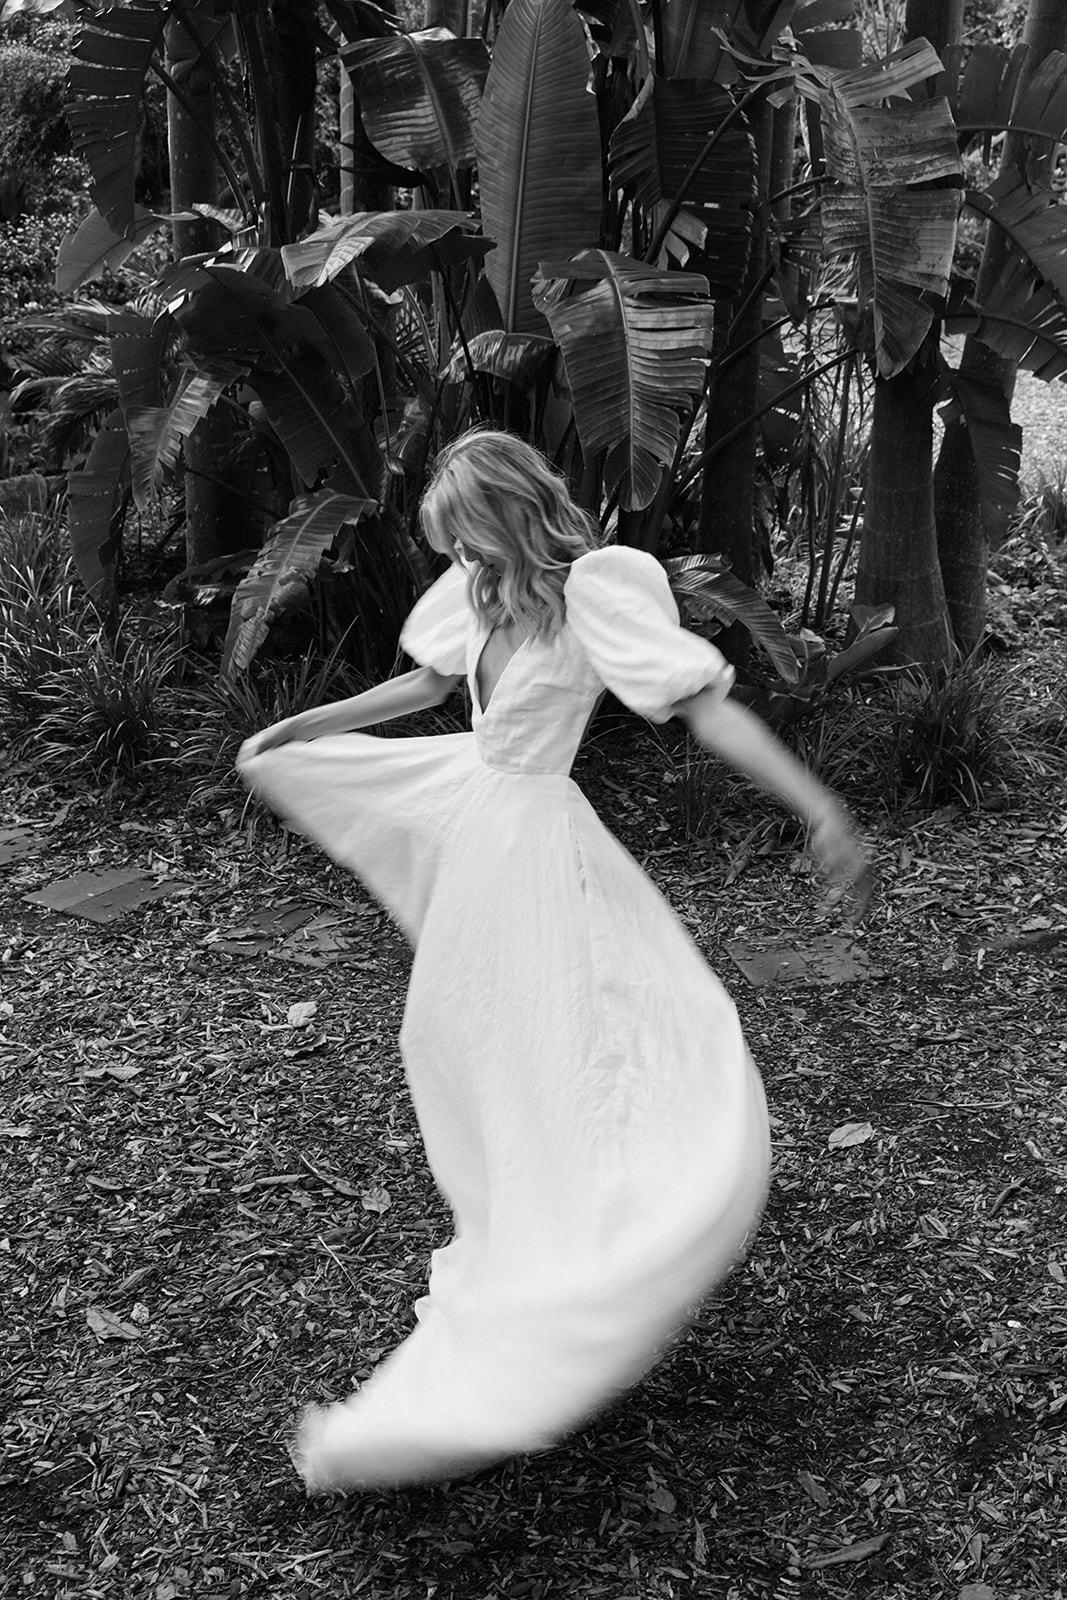 auldyn dress photo